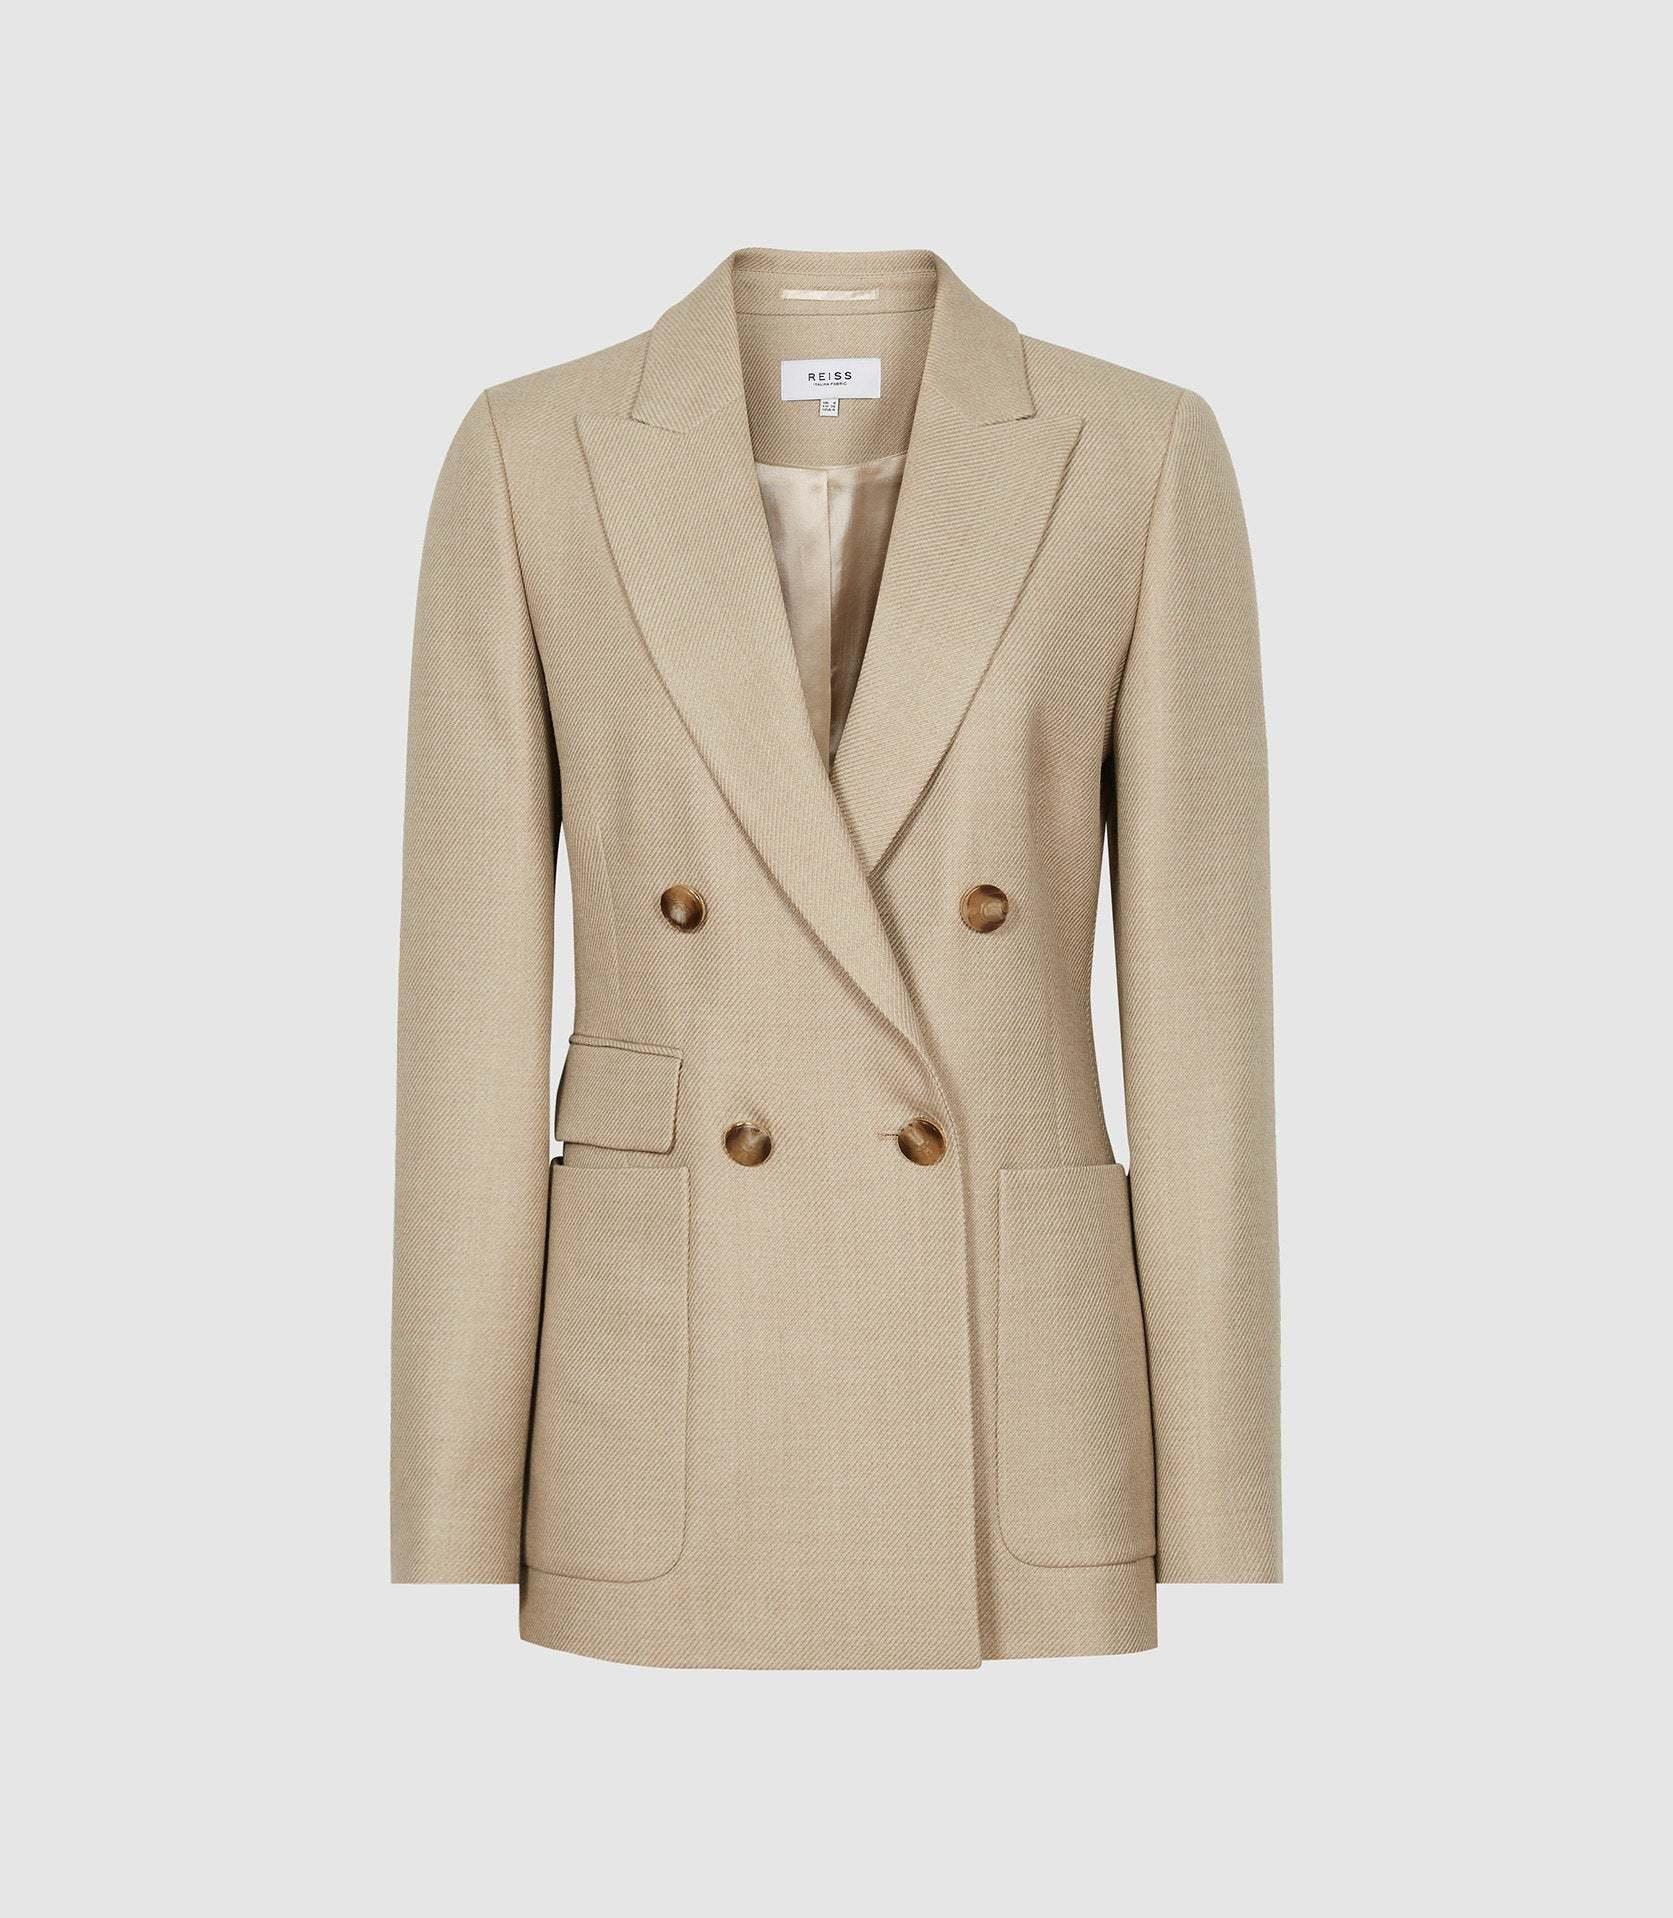 La auténtica de Kate Middleton: blazer cruzada Larsson de sarga, Reiss (285 euros).